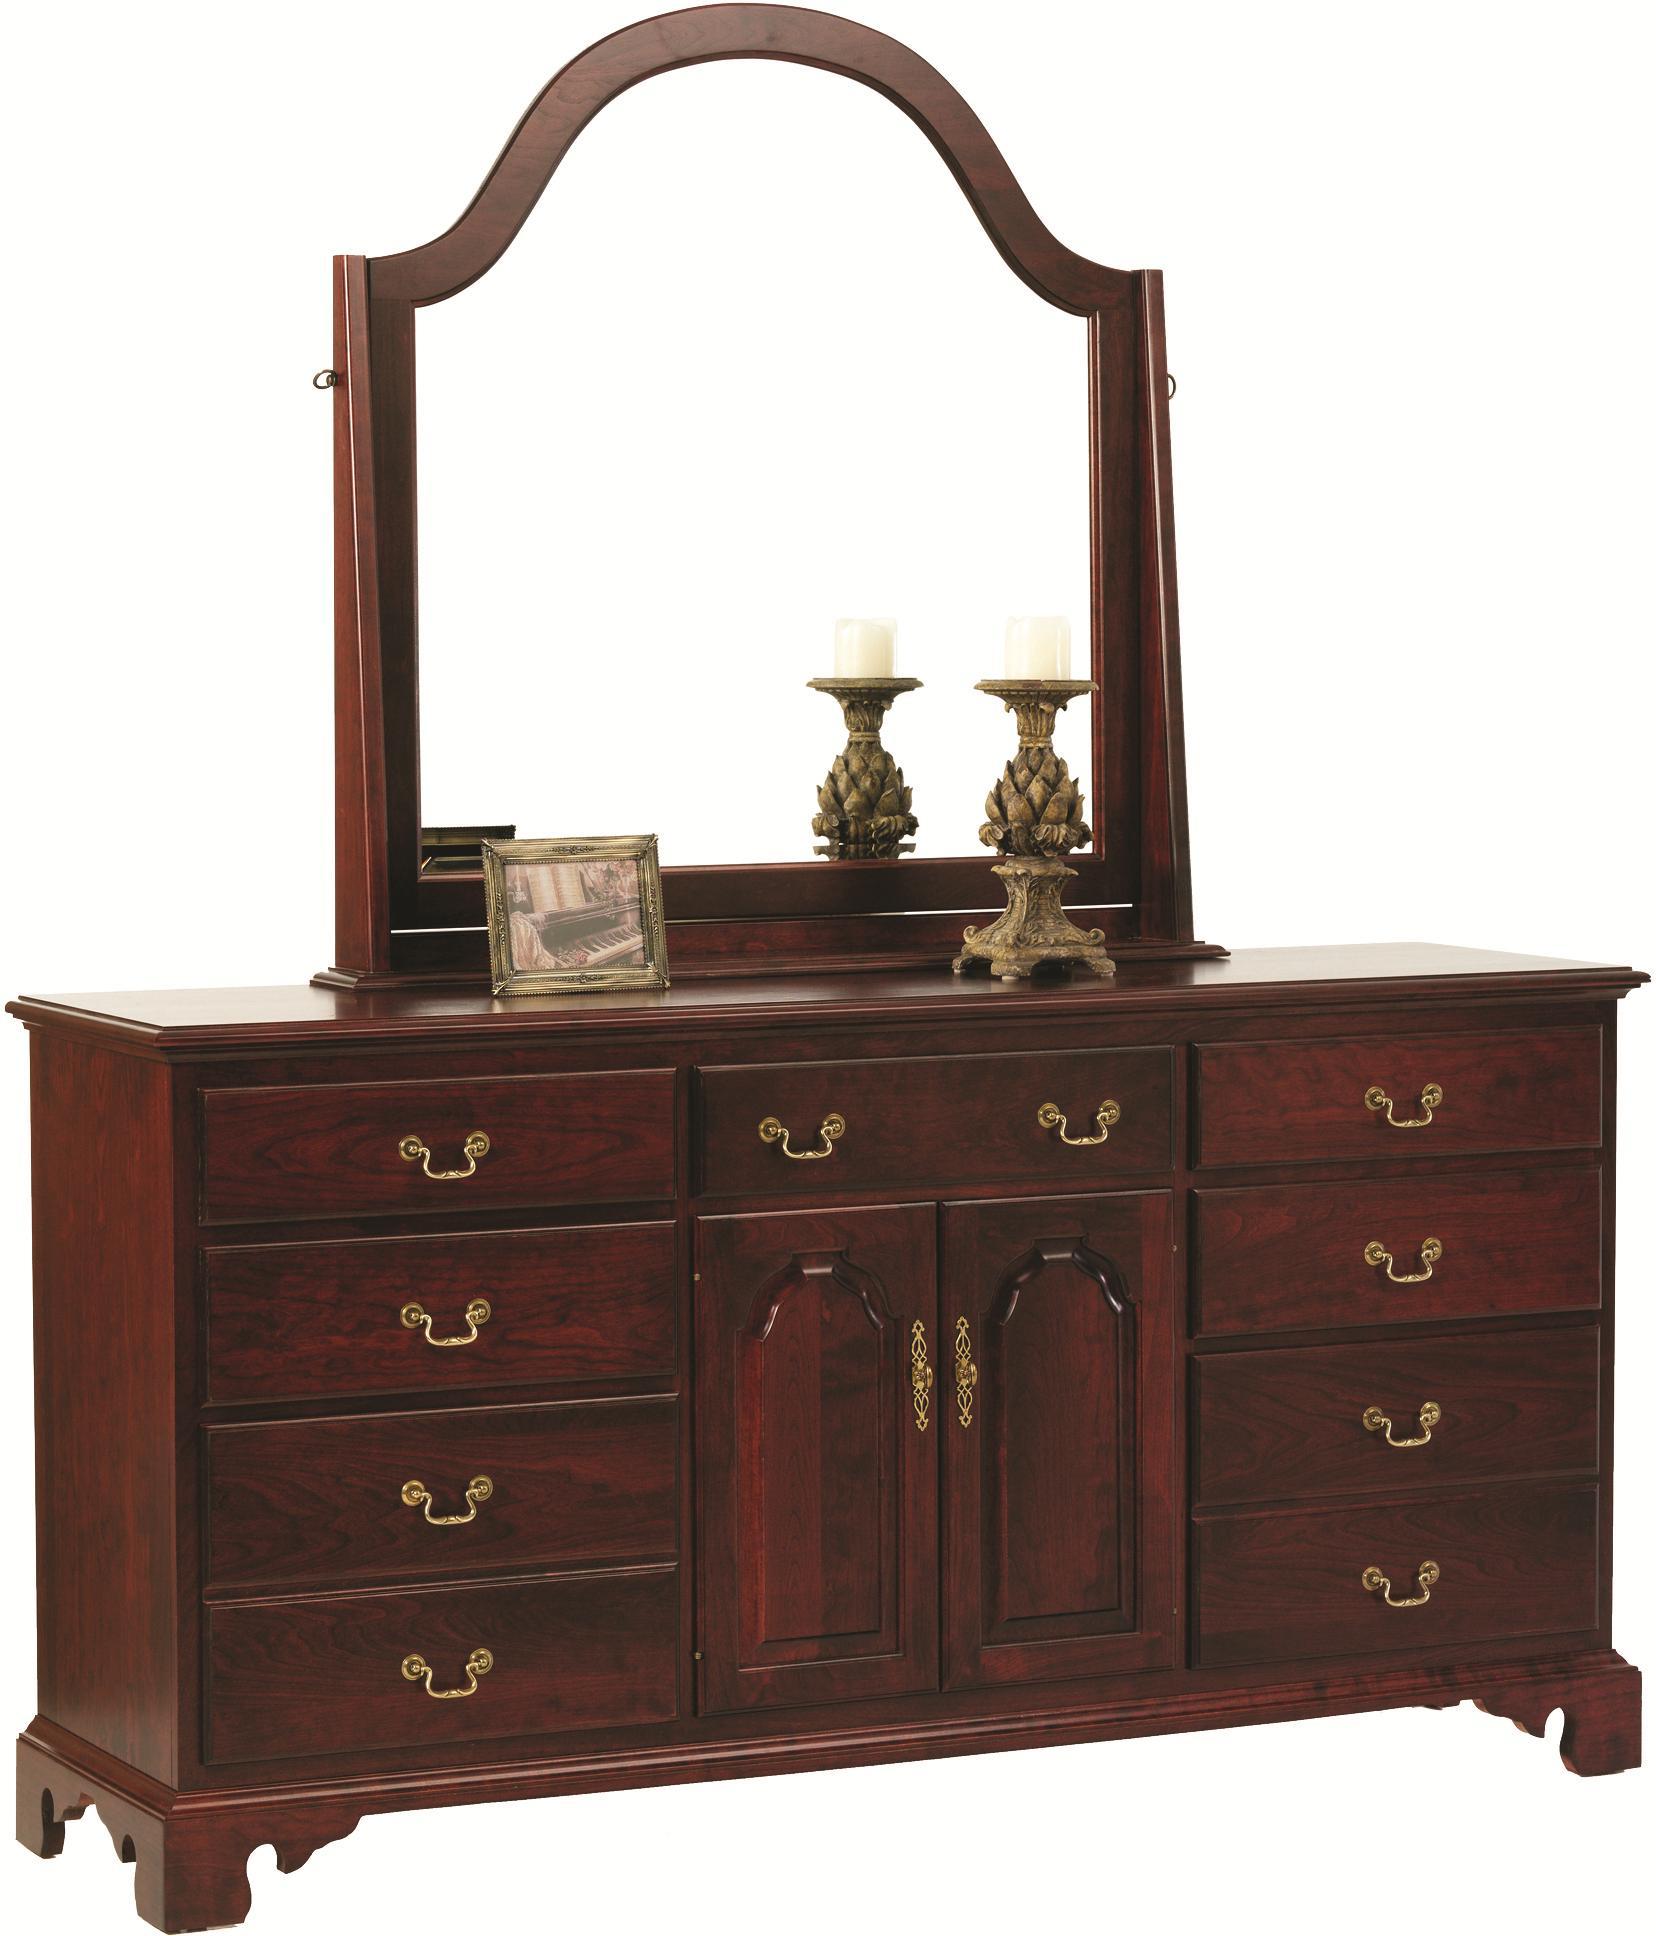 Elegant River Bend Dresser and Mirror by Millcraft at Saugerties Furniture Mart